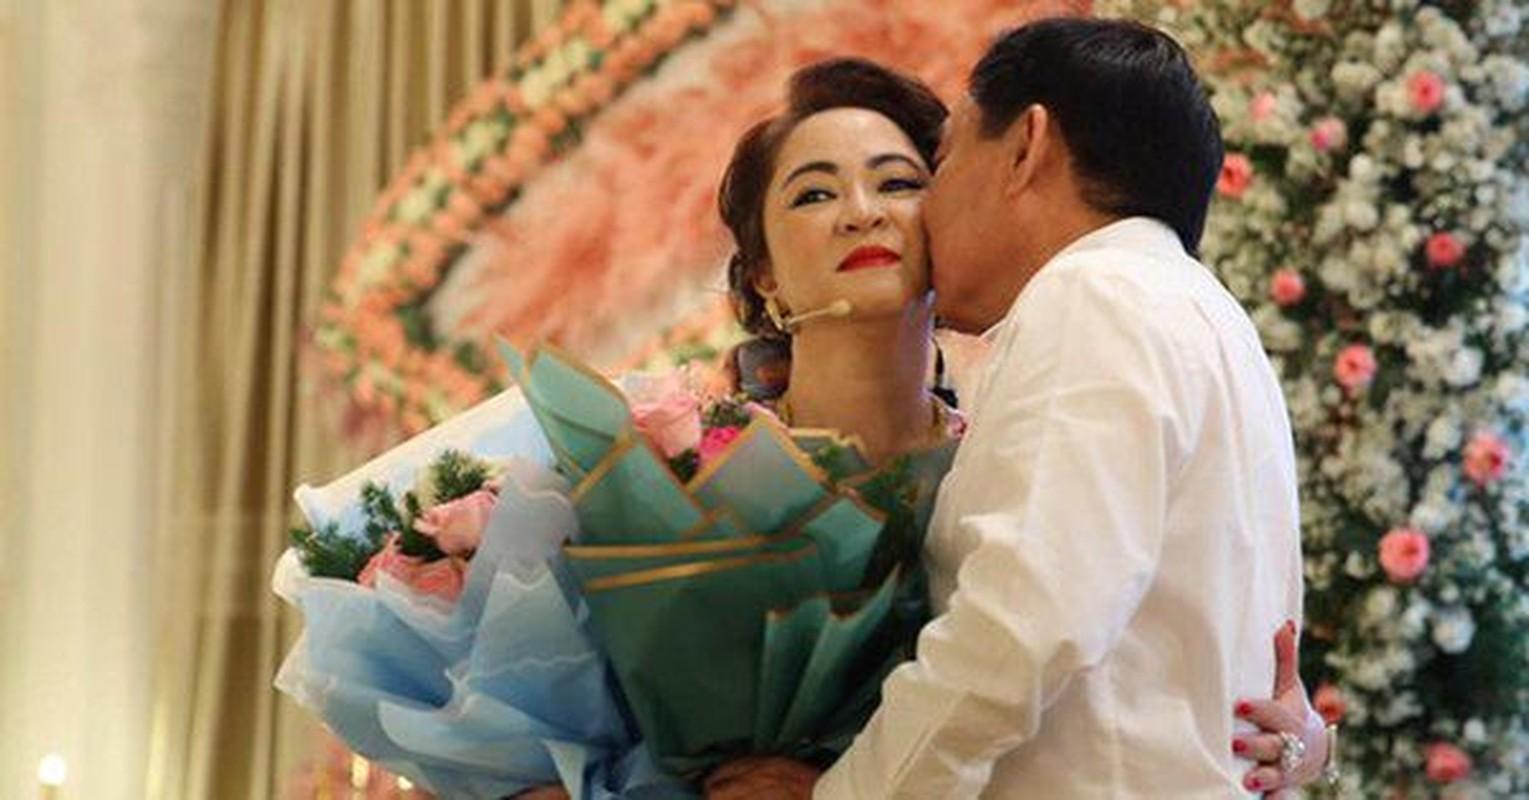 Netizen to mo cach doi xu voi con rieng cua chong ba Phuong Hang-Hinh-9